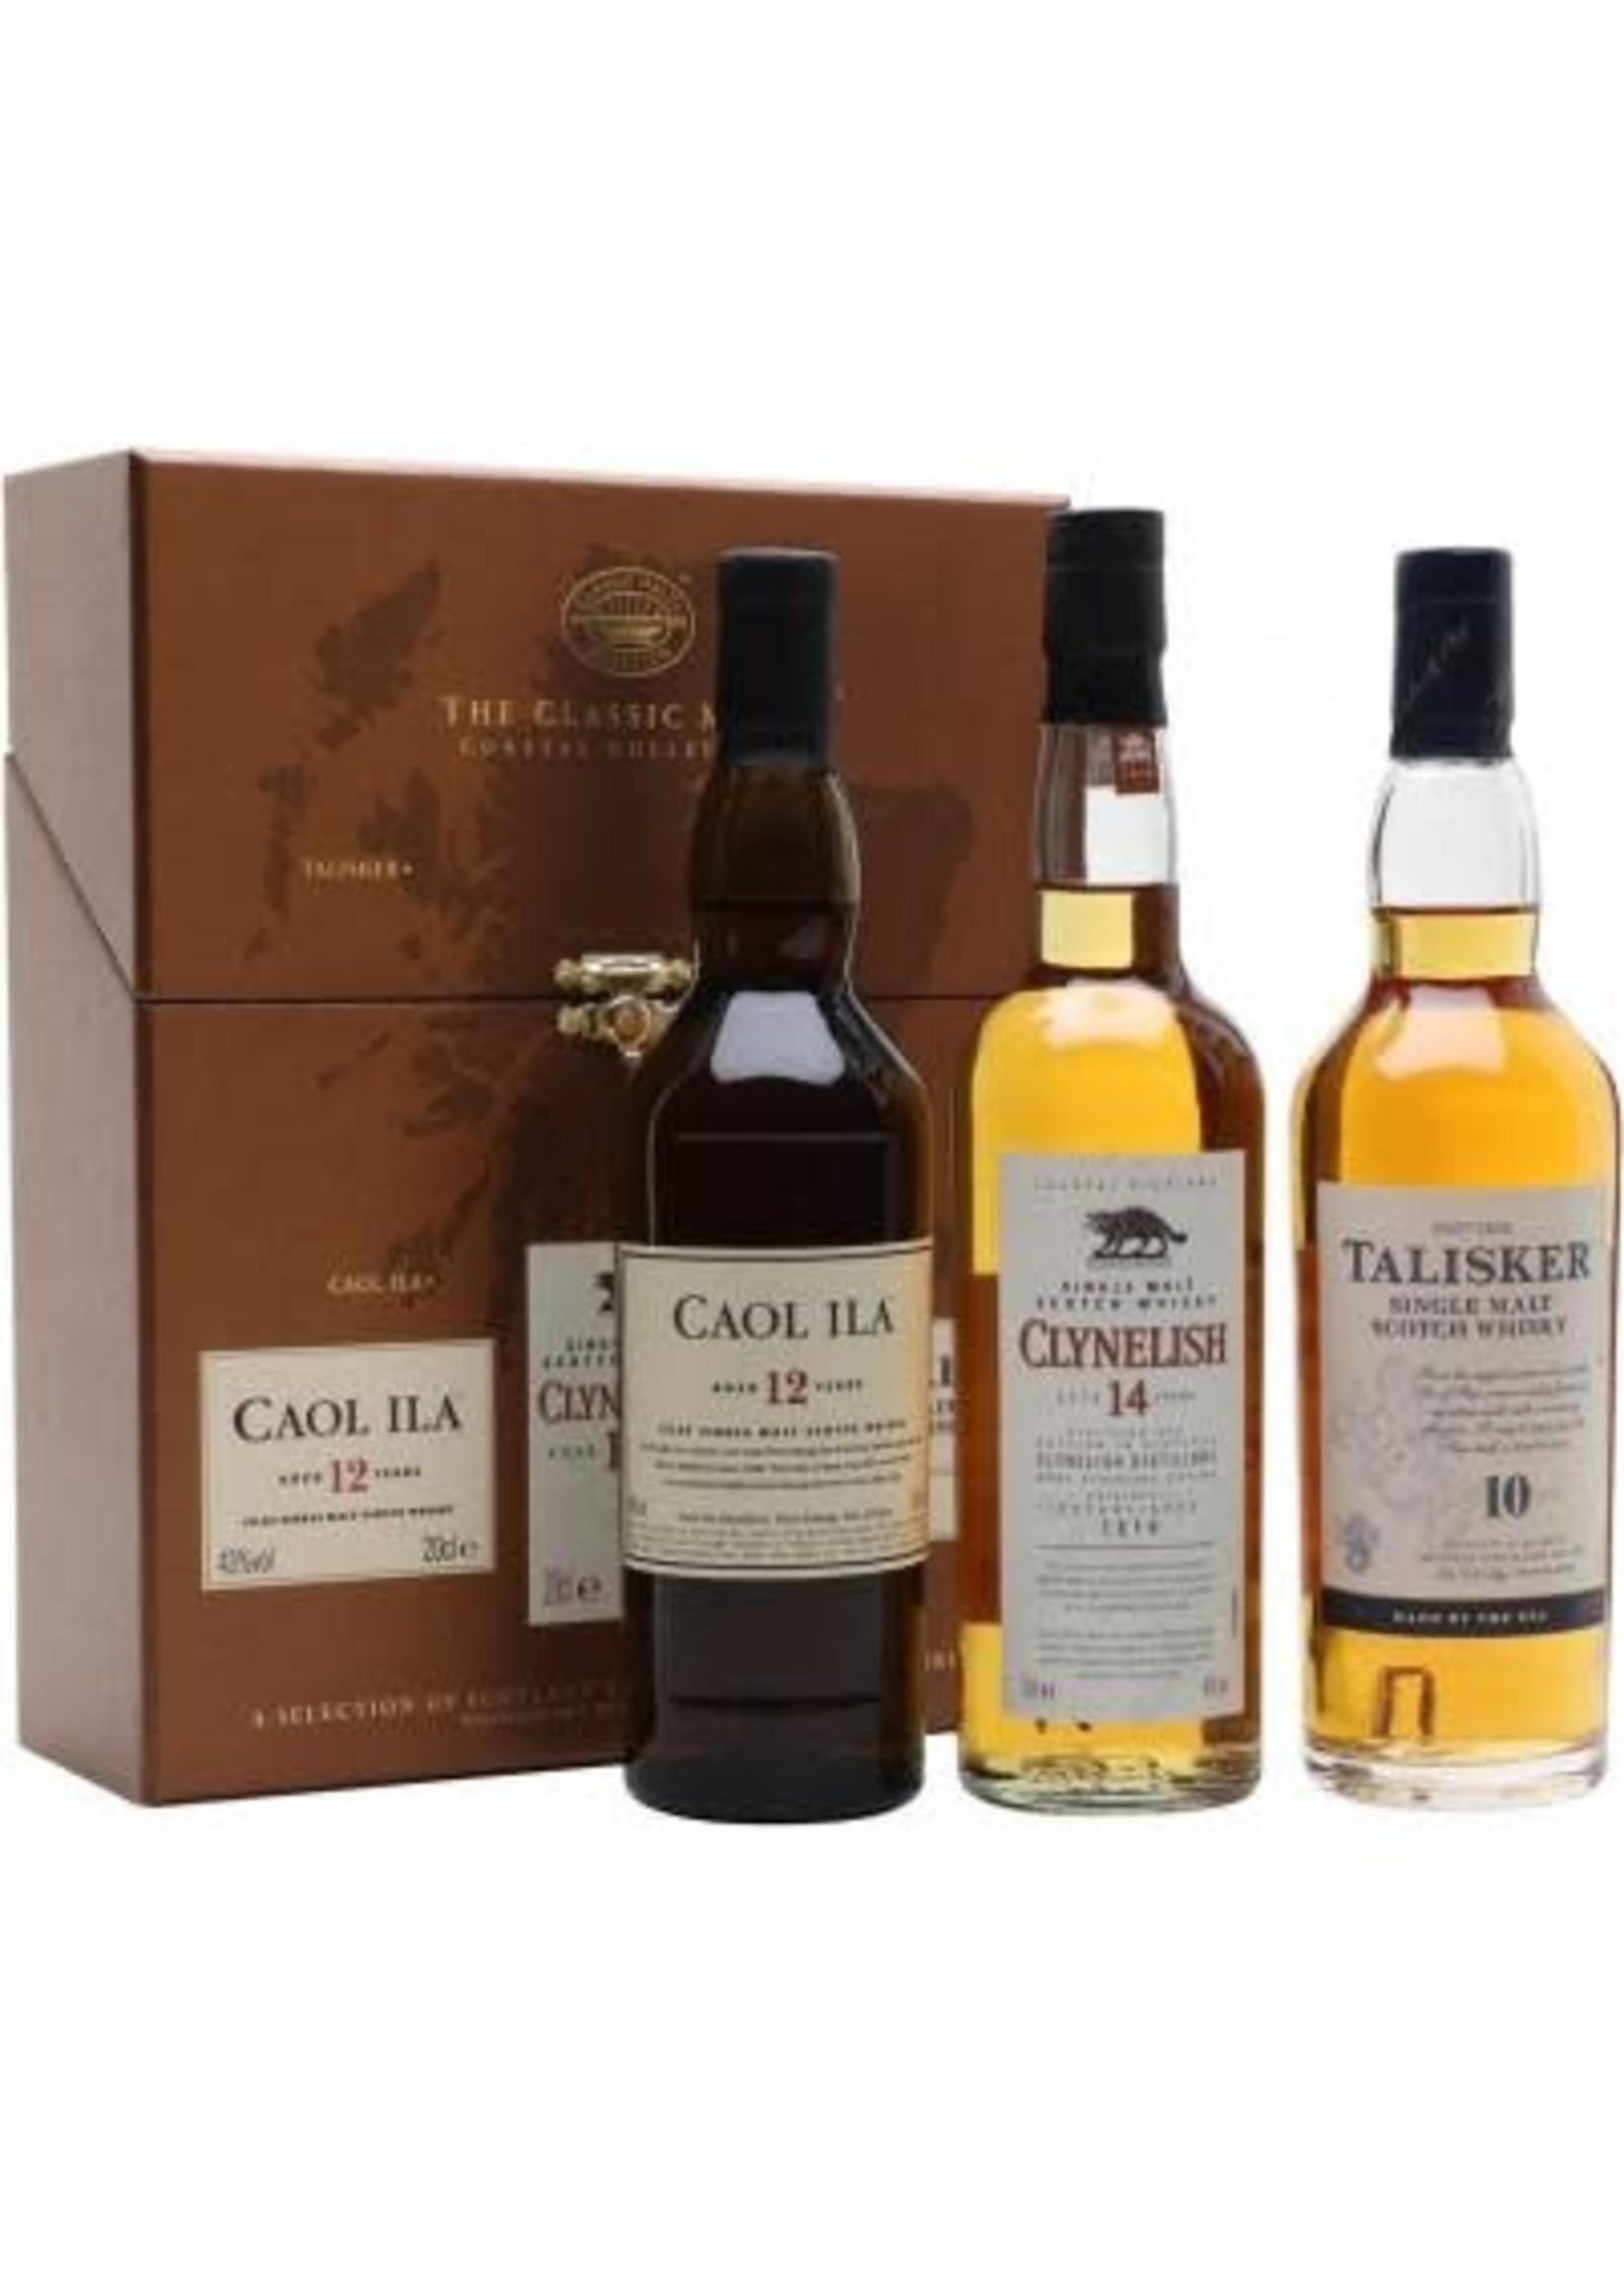 Diageo Classic Malts Selections / Coast (10 Year Old Talisker, 12 Year Caol Ila, 14 Year Clynelish)) / 200mL